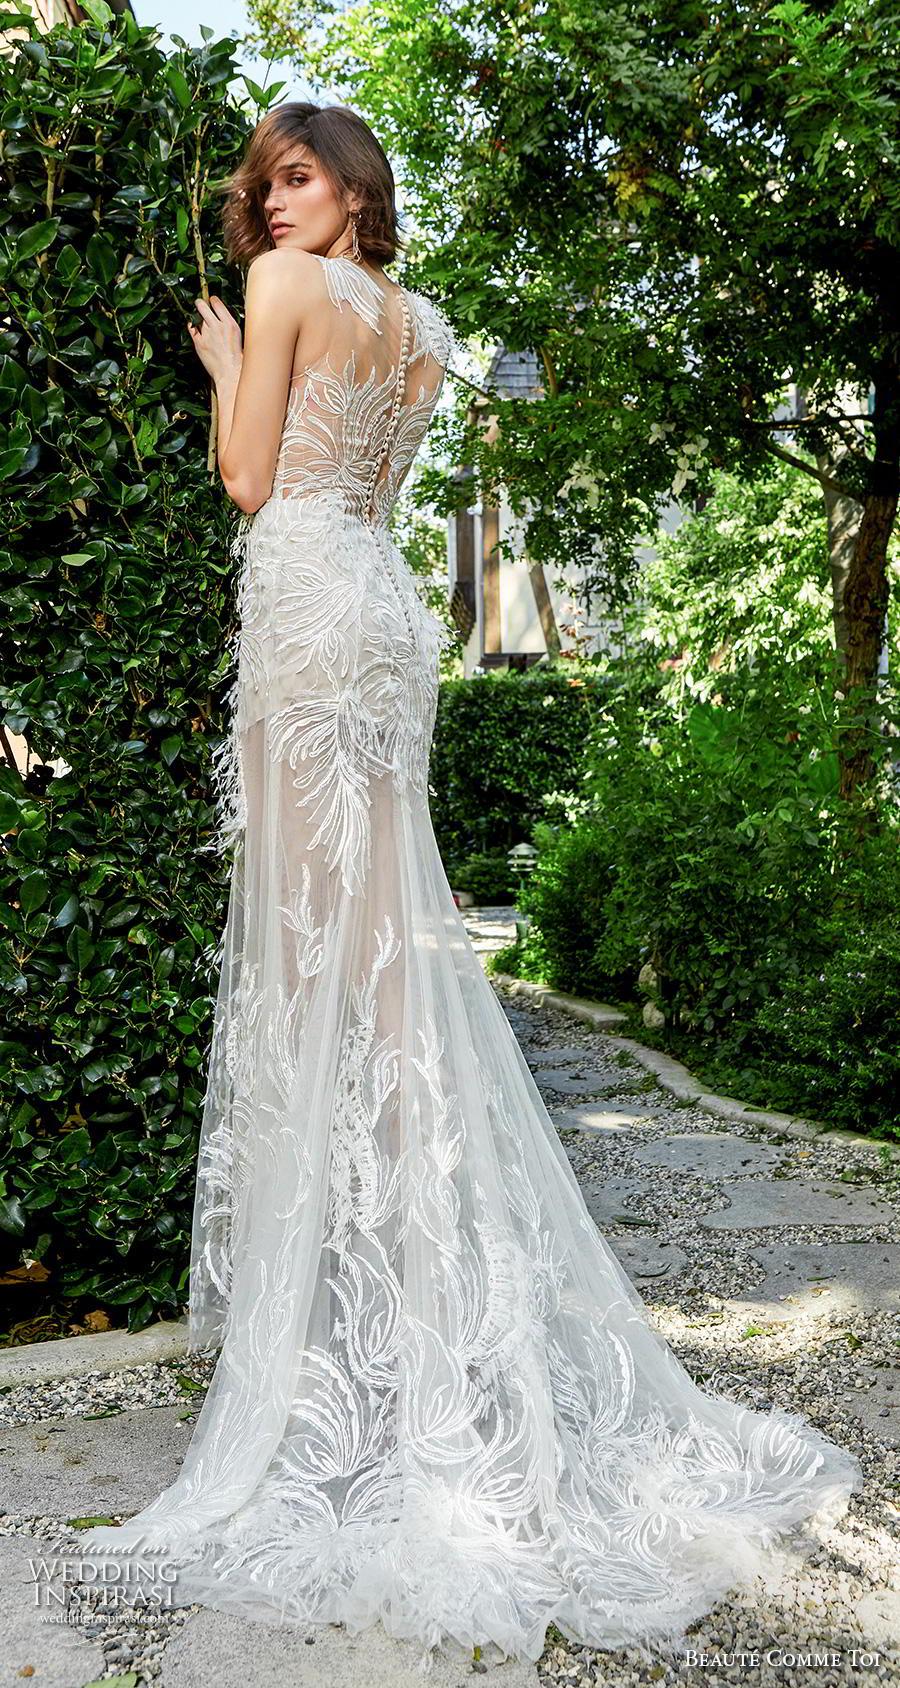 beaute comme toi f2020 bridal feather one shoulder sleeves illusion neckline full embellishment elegant glamorous fit and flare sheath wedding dress lace button back medium train (miya) bv